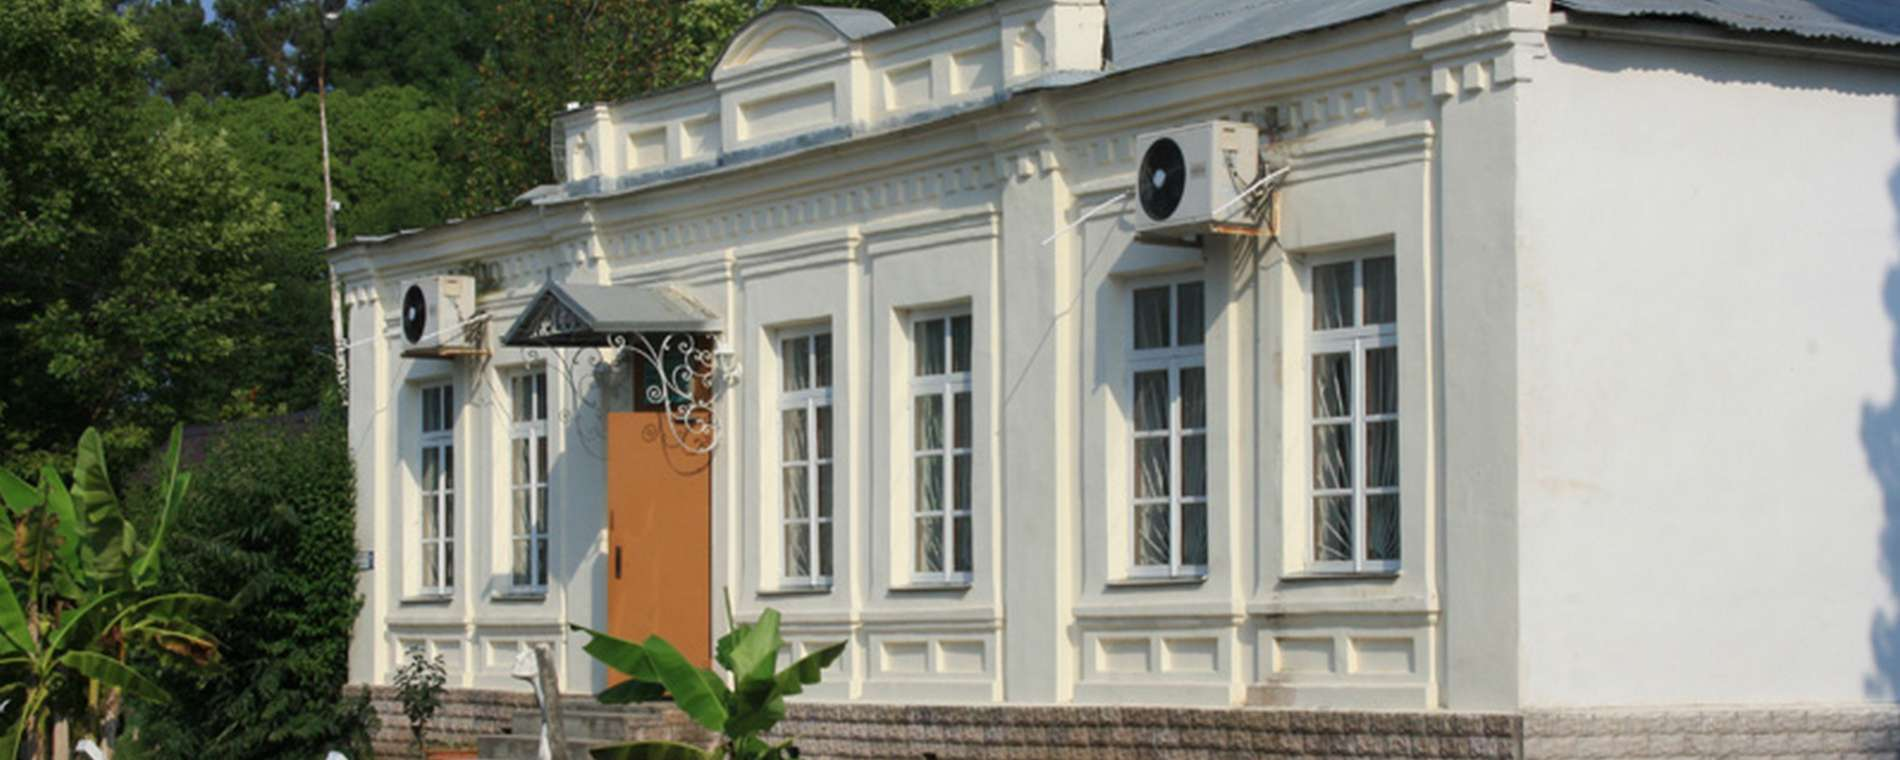 Краеведческий музей «Абазгия» (Гудаута)